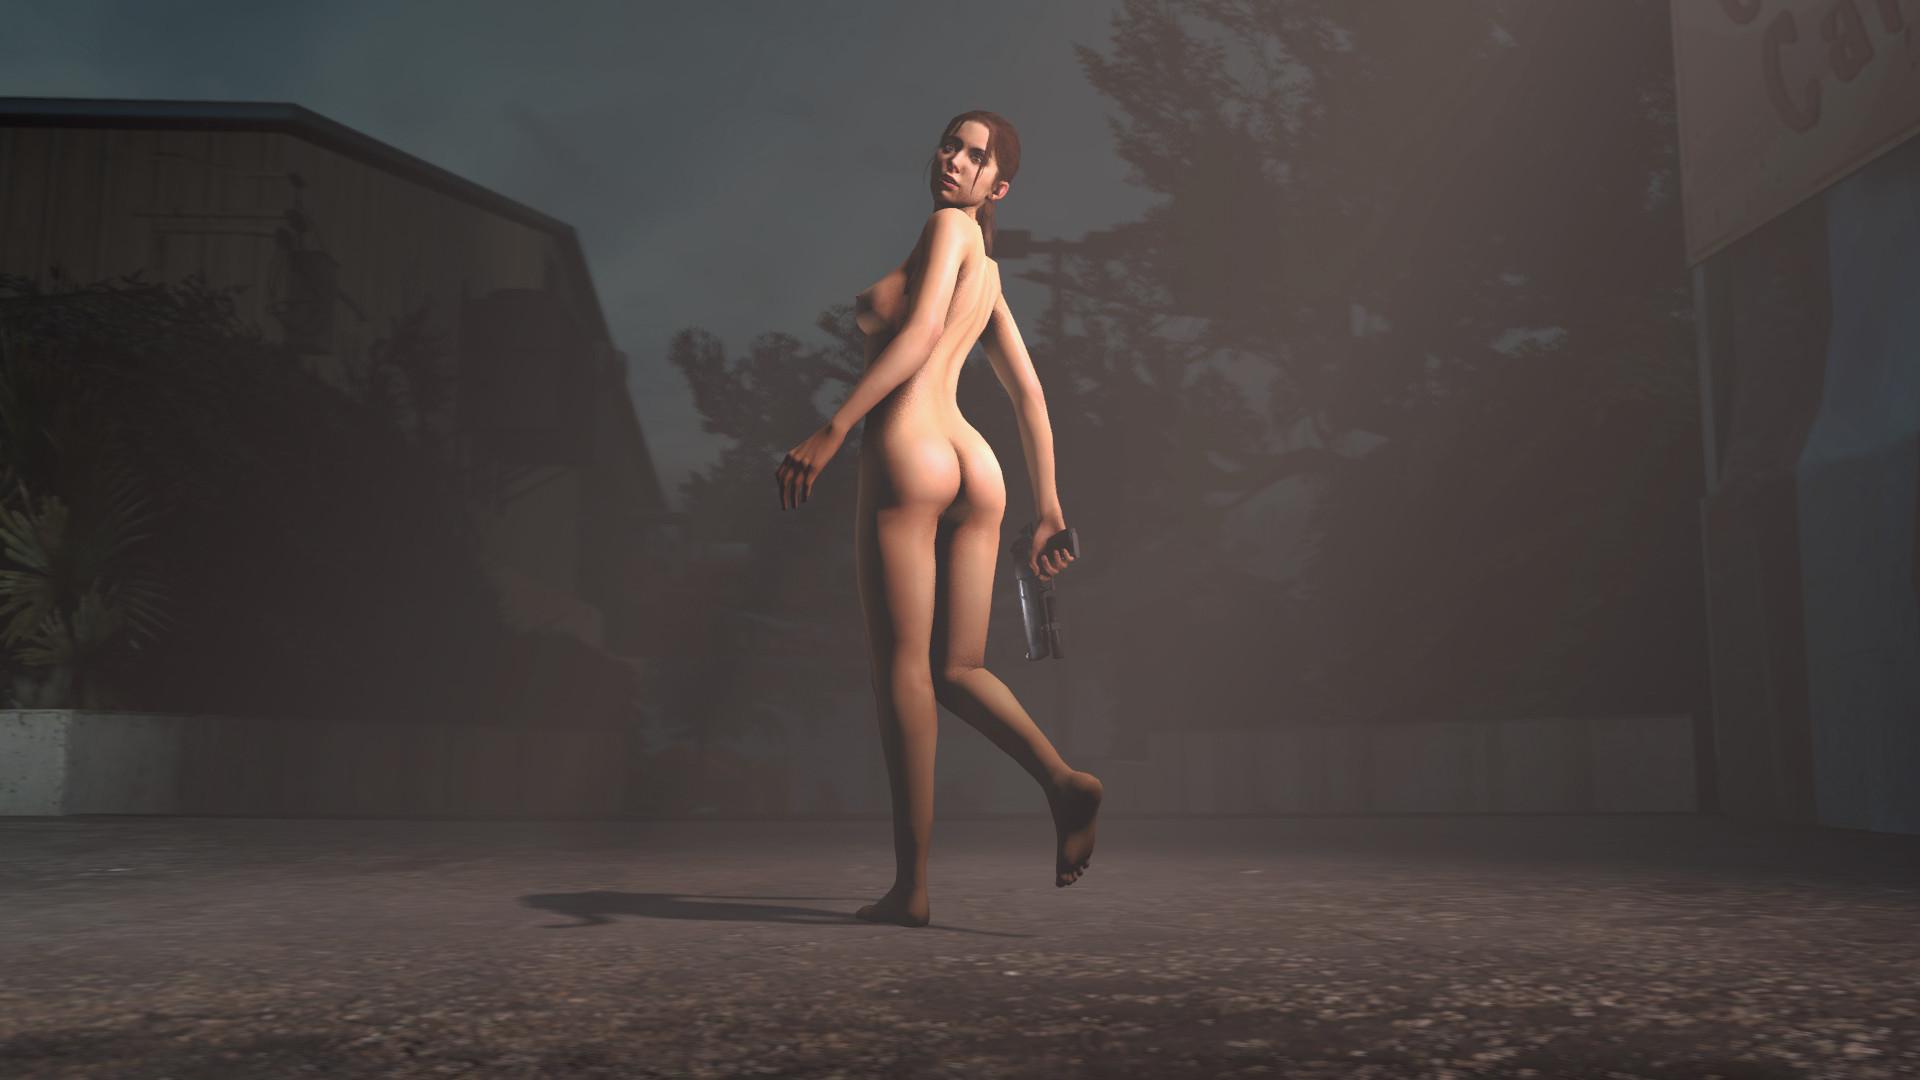 Pic barehack nudeskins adult pic